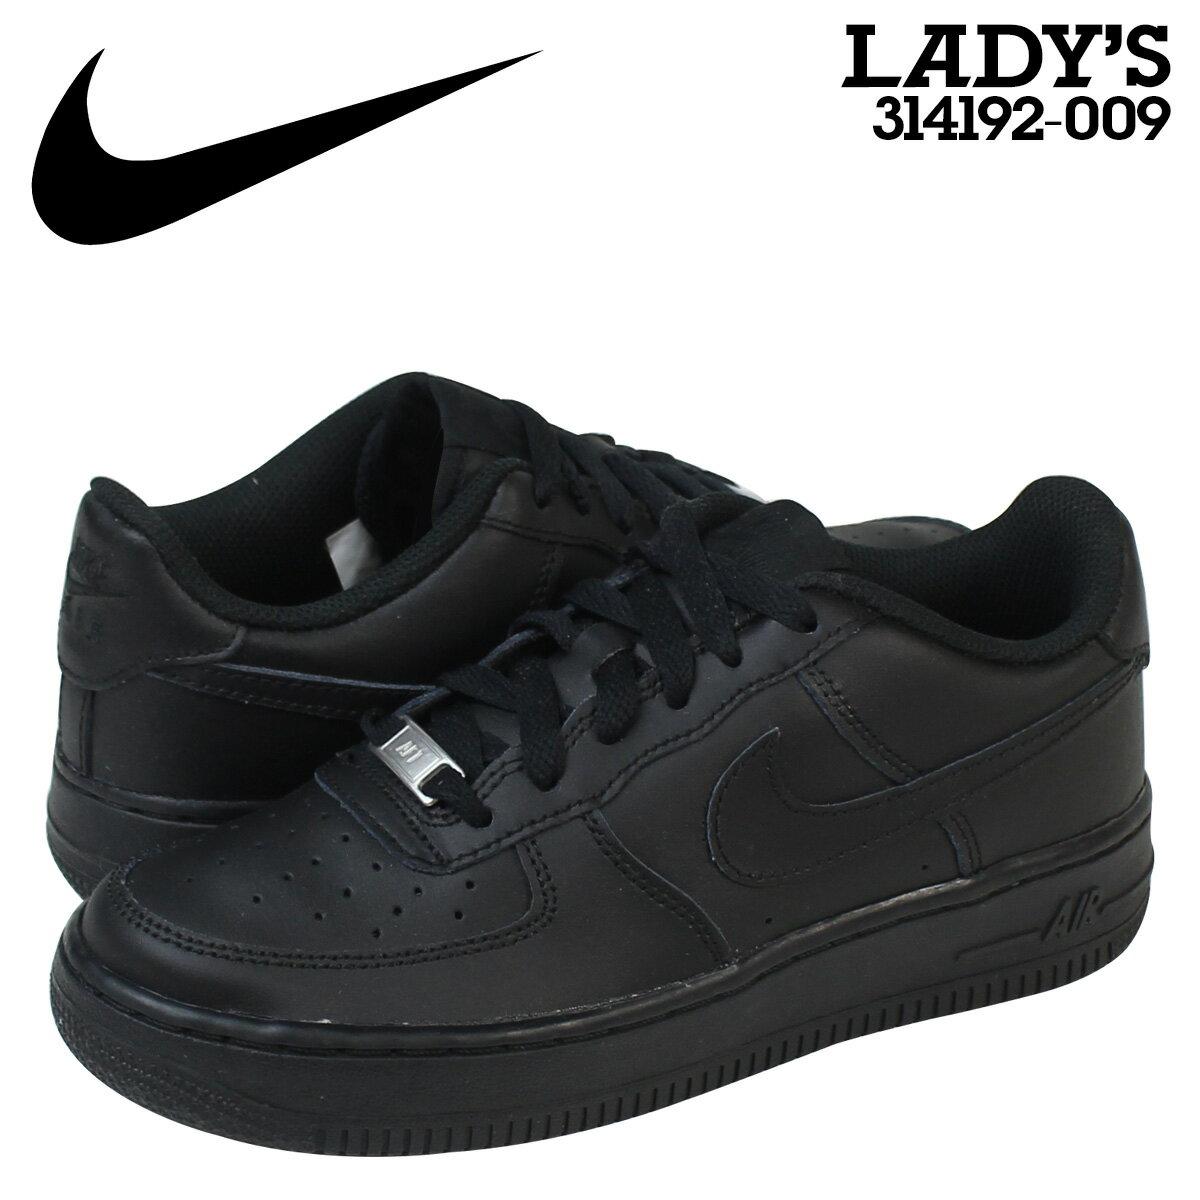 Nike Air Force 1 Low Womens Black